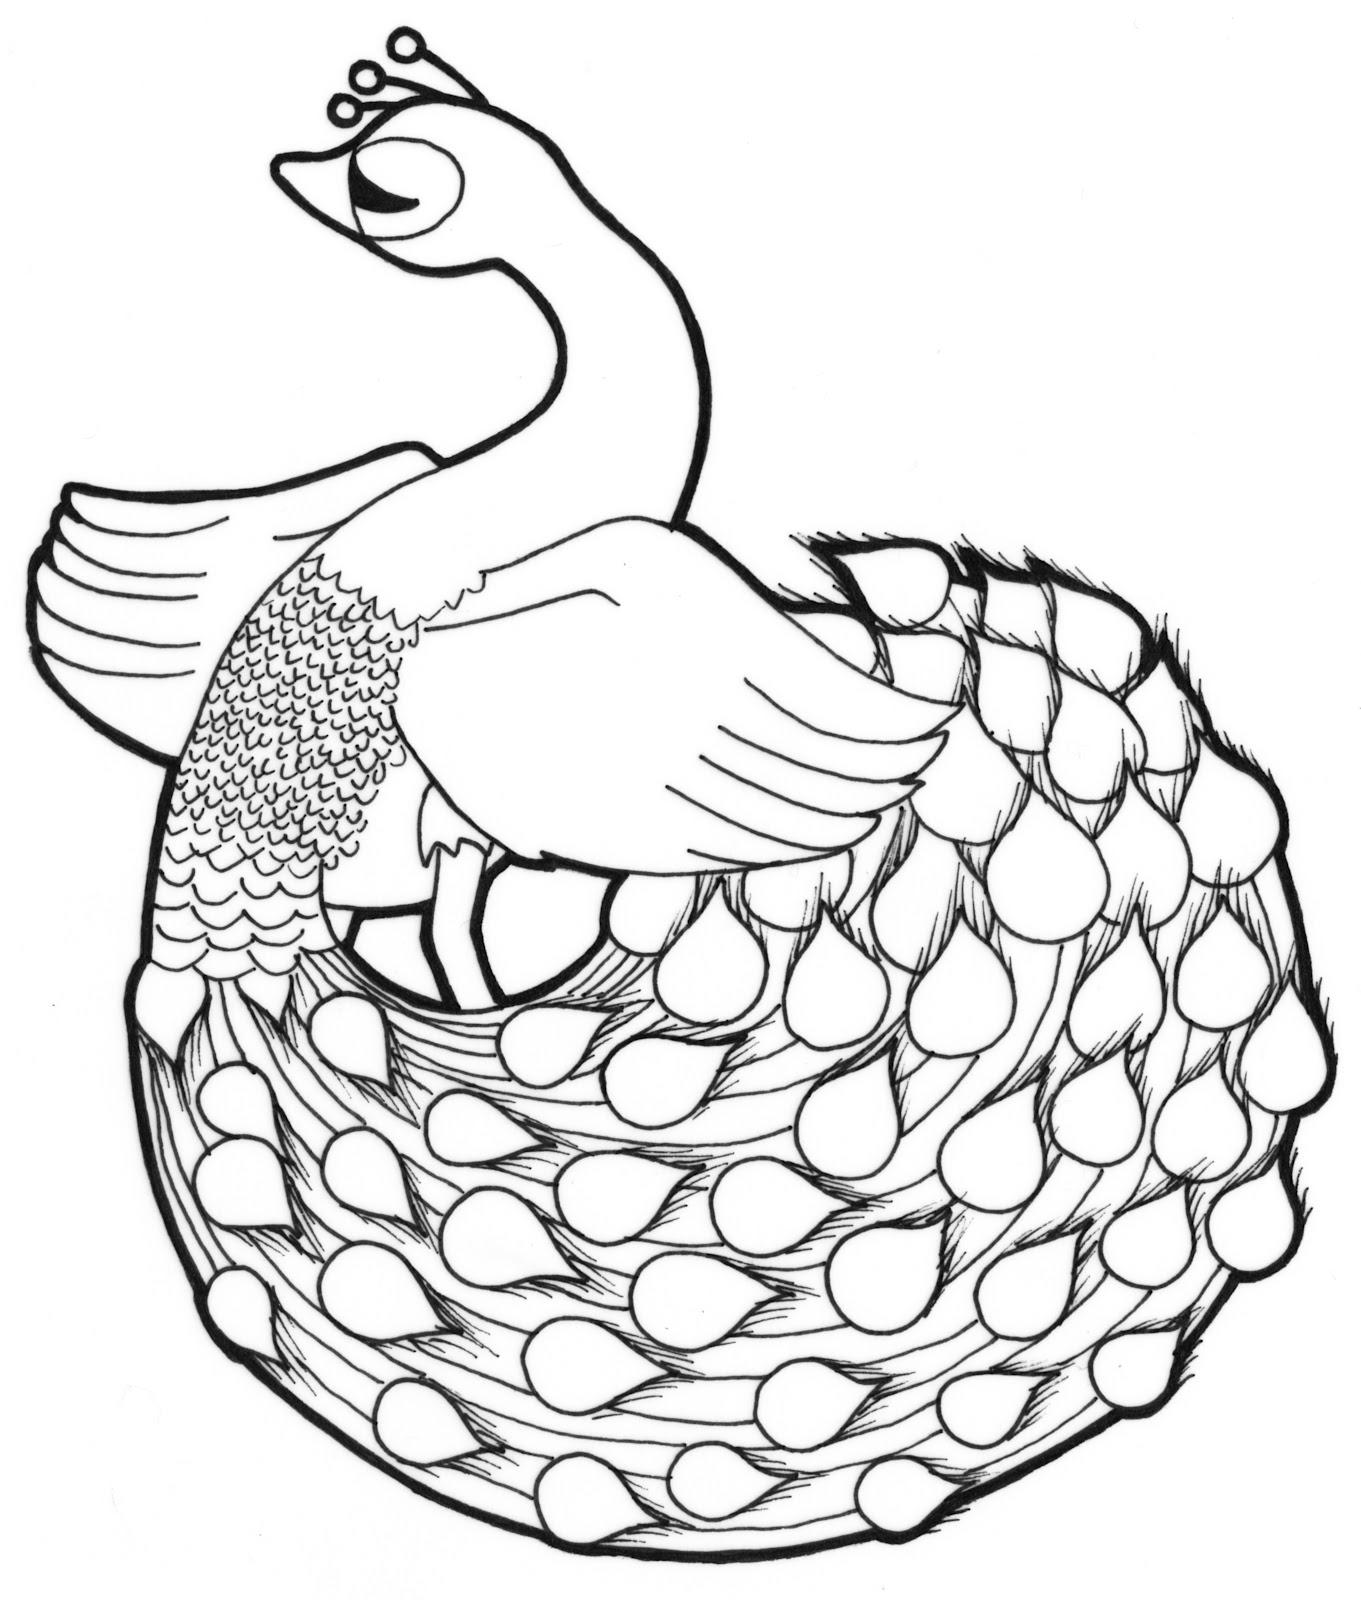 Peacock body outline - photo#22